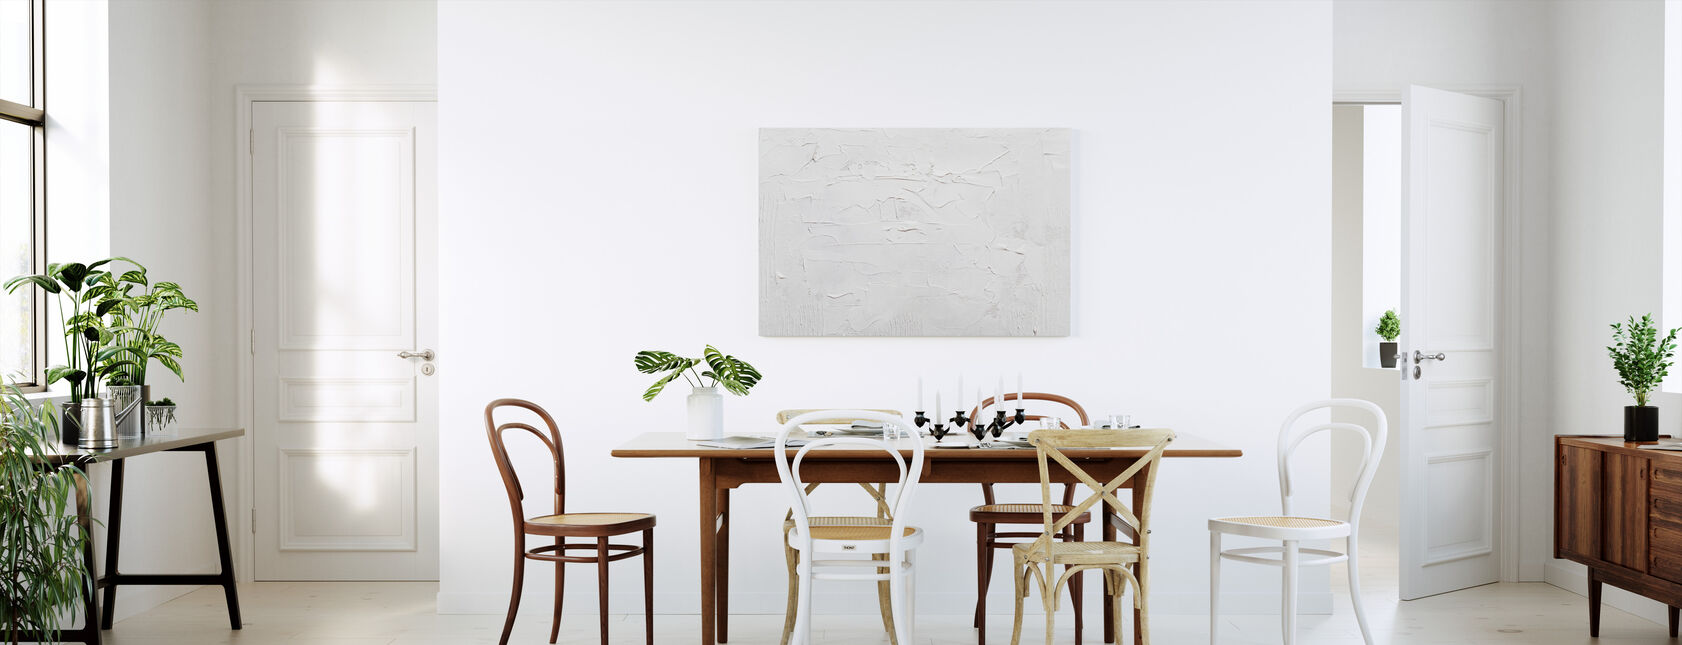 Vit bakgrund - Canvastavla - Kök